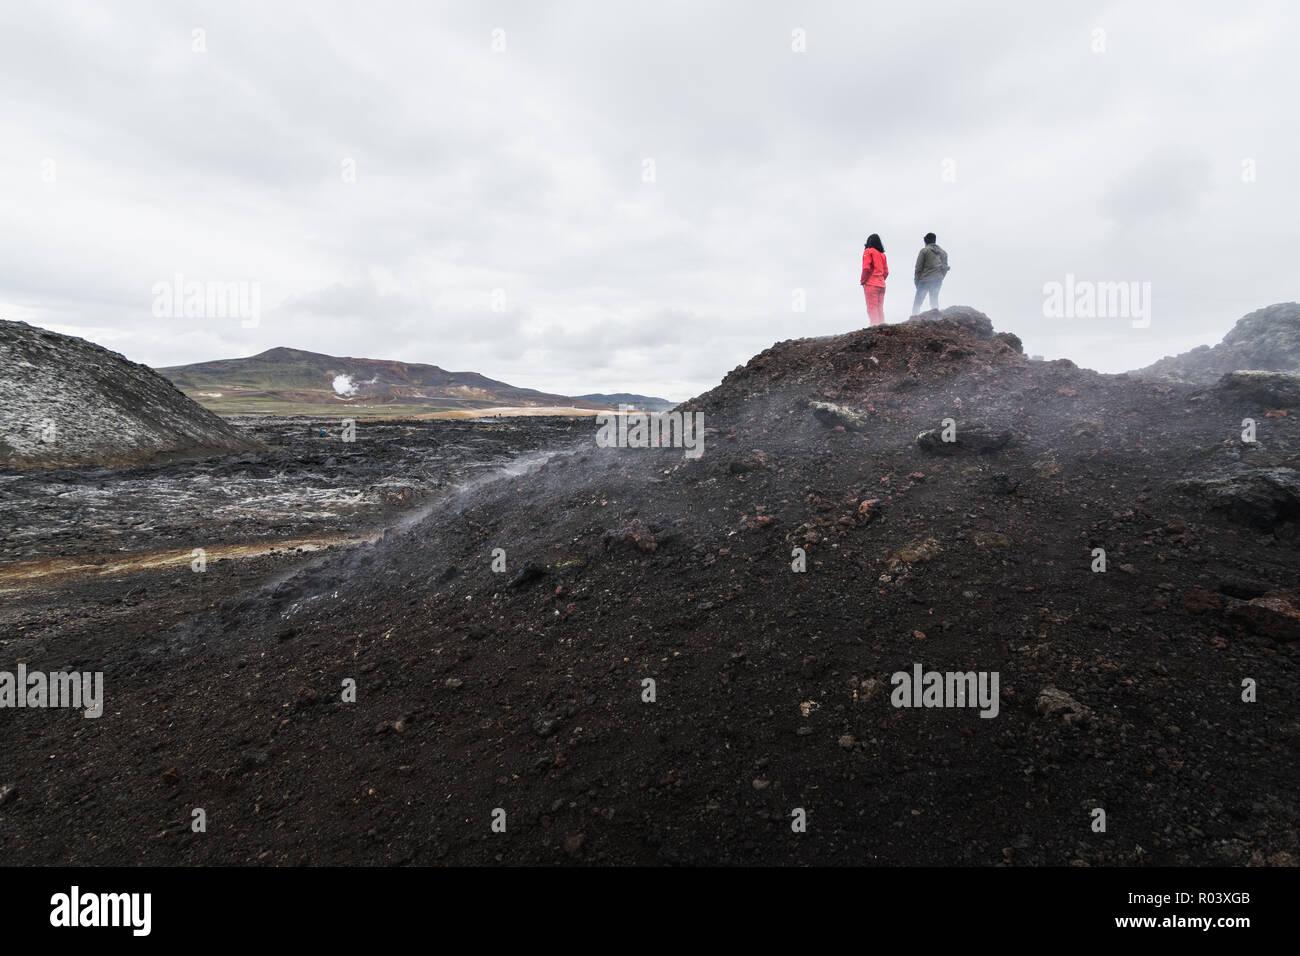 Woman and man figures standing in Krafla volcano lava field around Leirhnjukur mountain peak, Iceland. - Stock Image